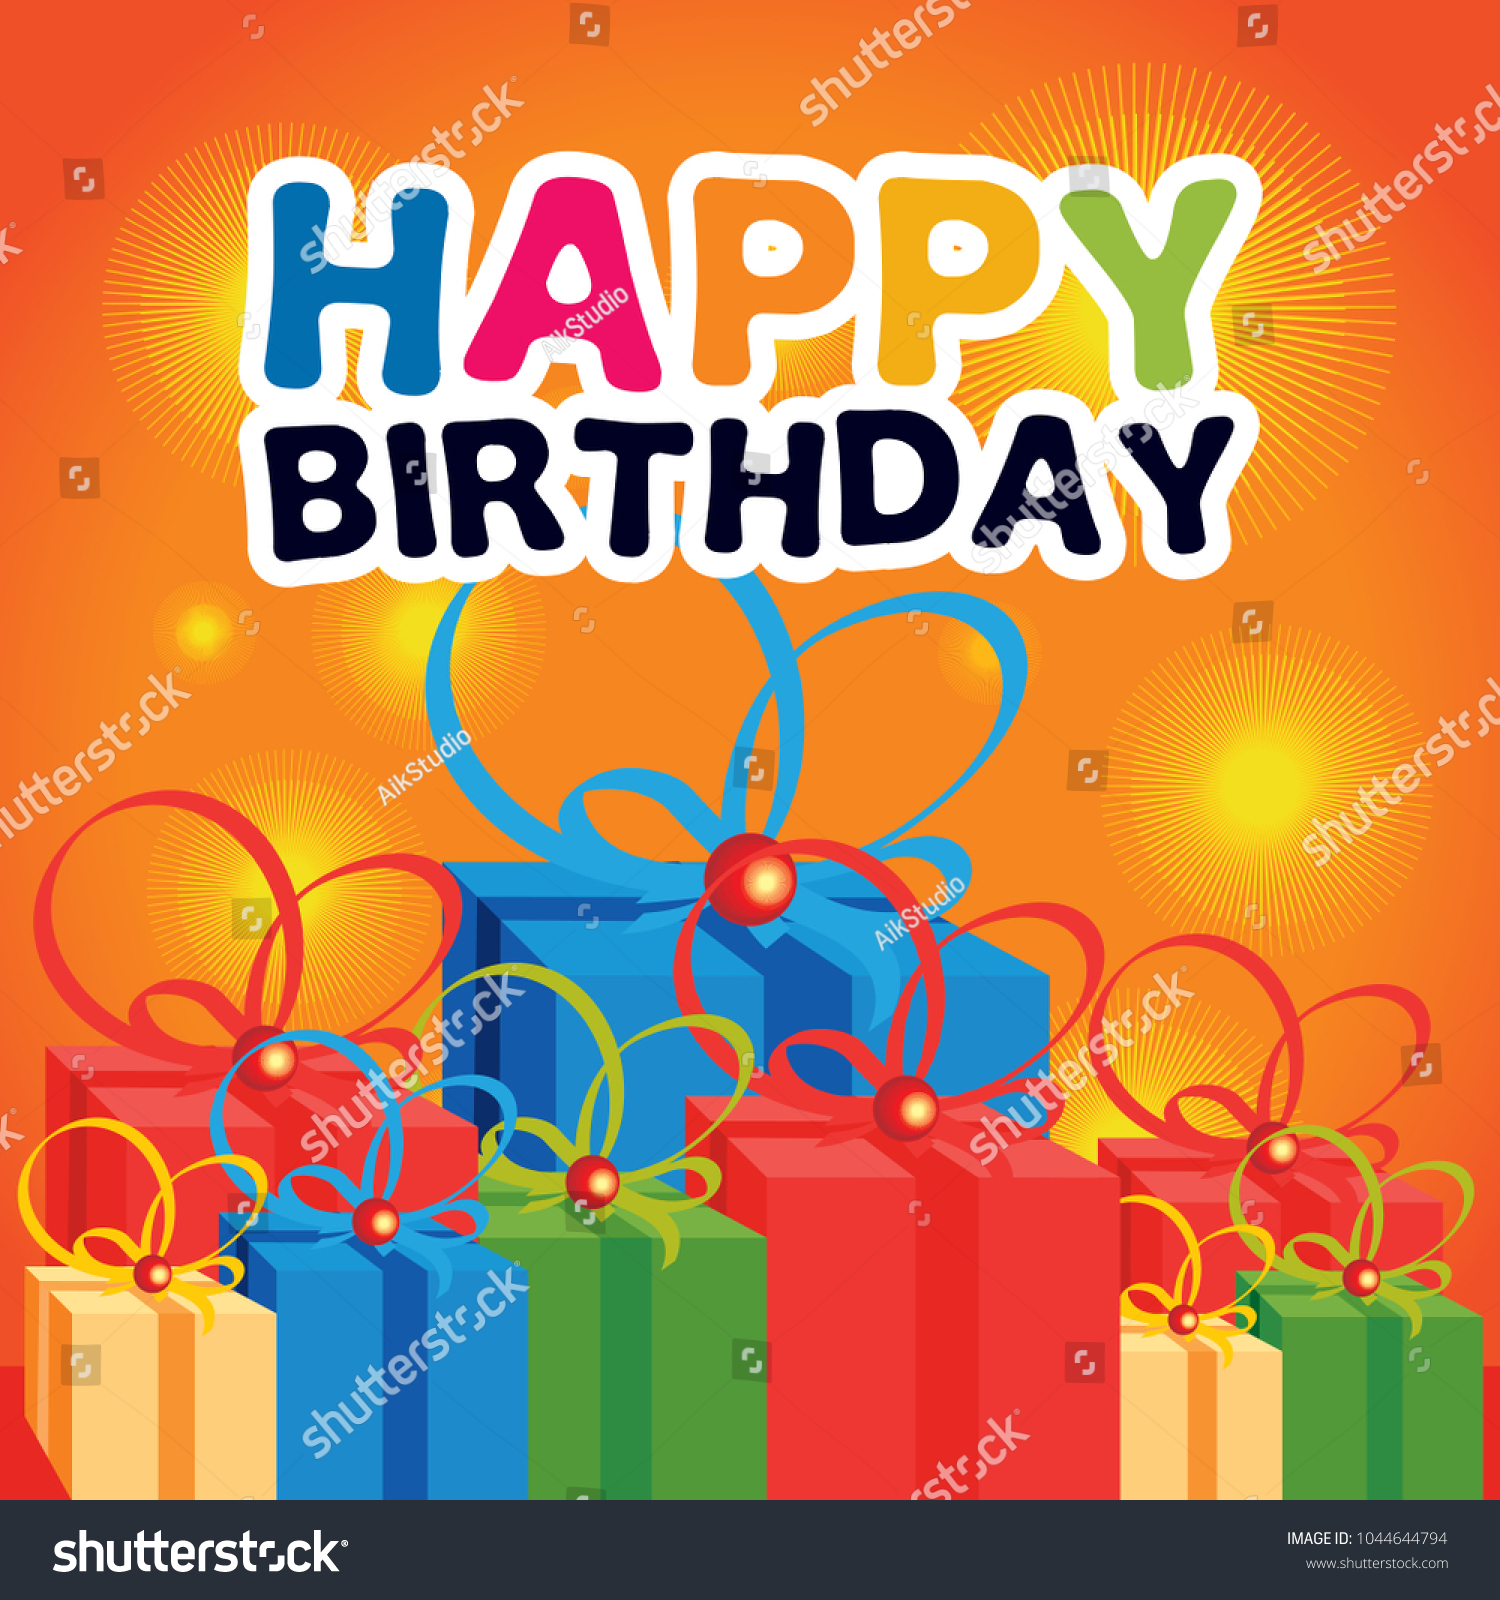 Happy Birthday Greetings Card Design Element Stock Vector Royalty